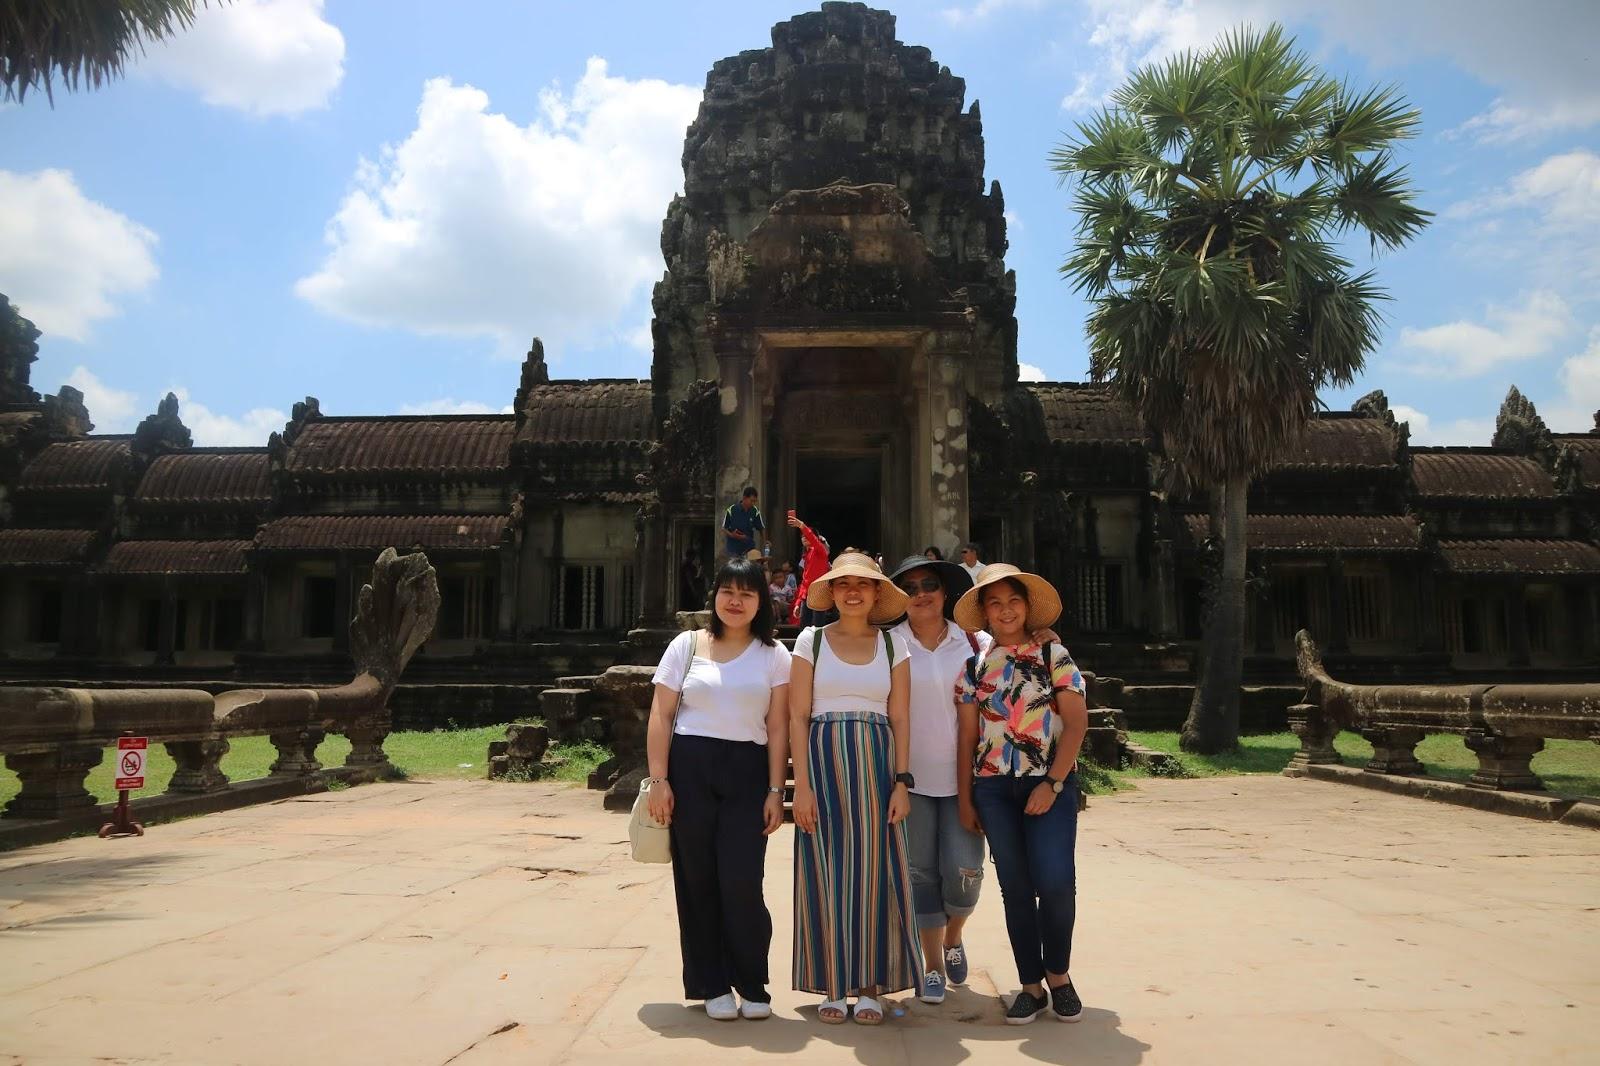 Group photo outside Angkor Wat